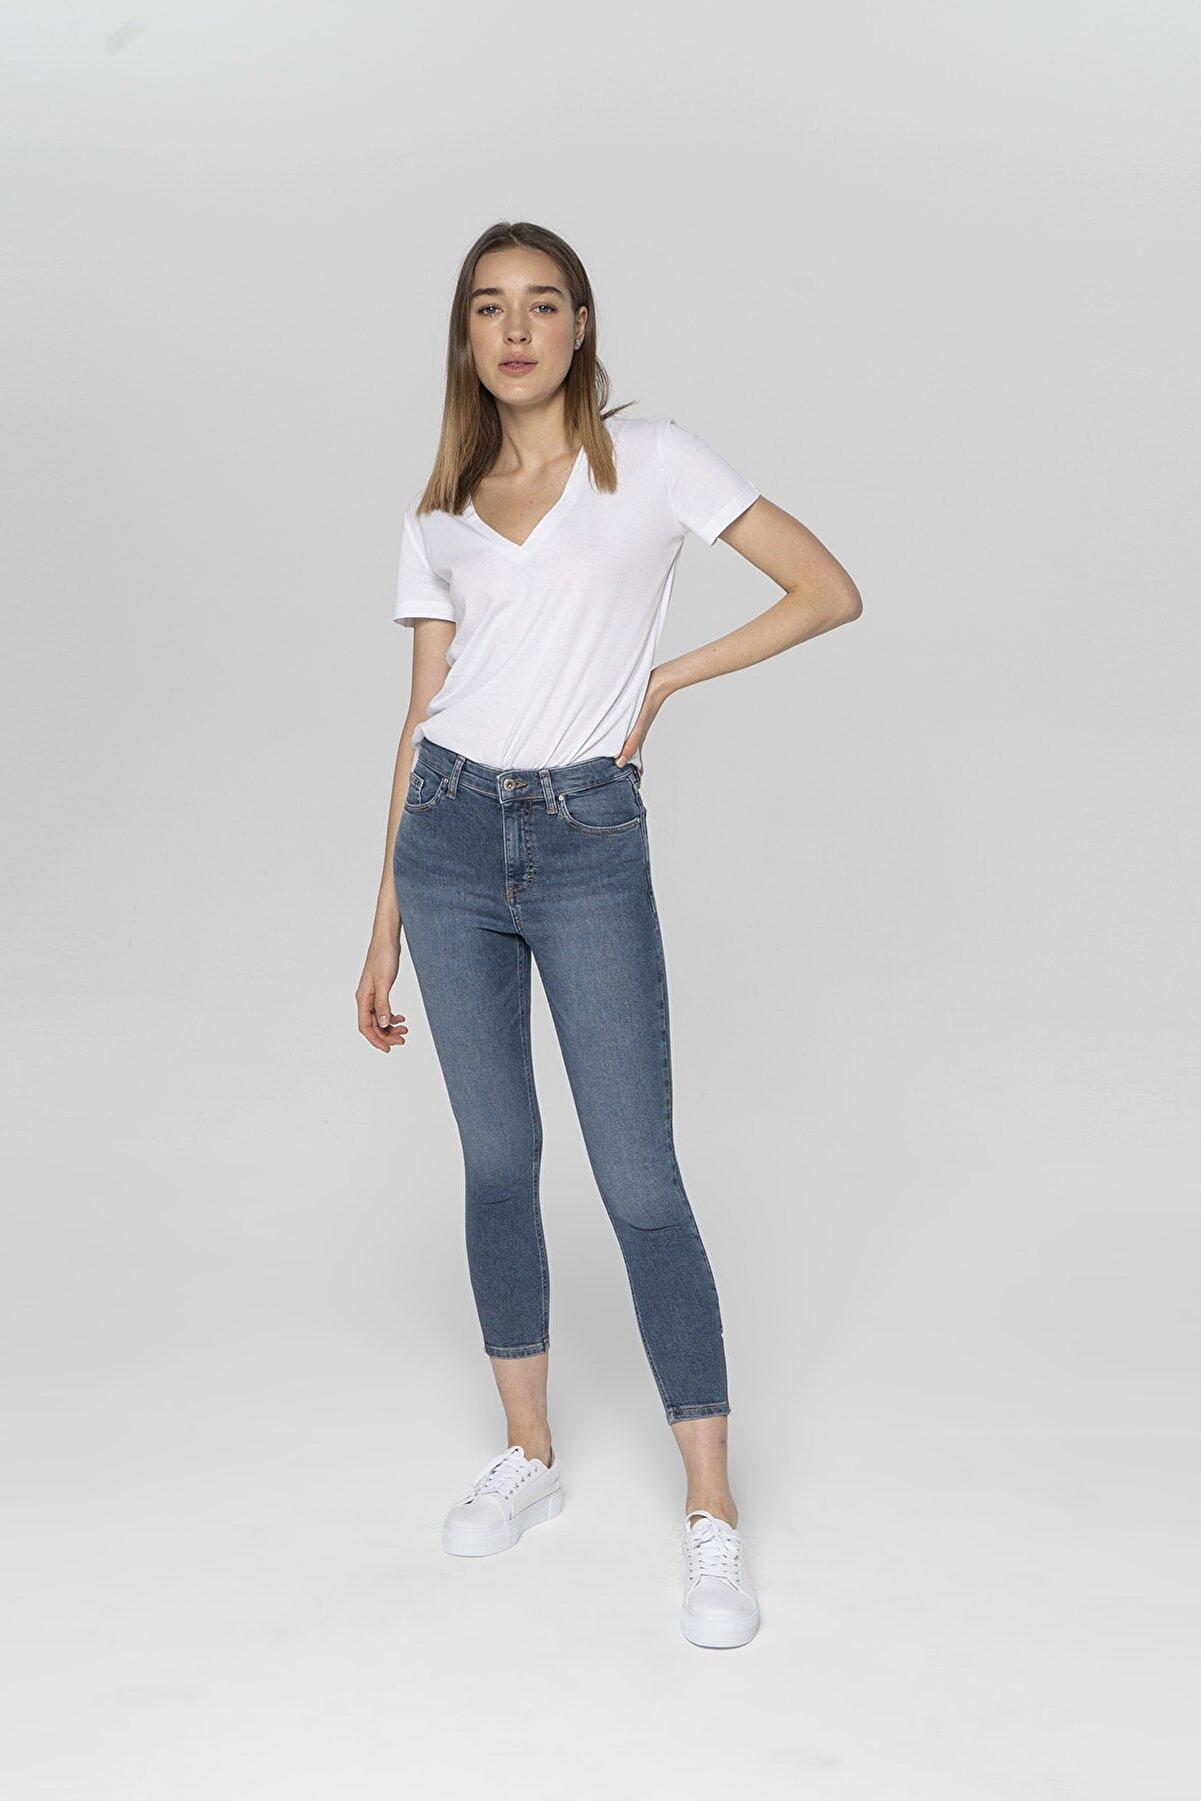 CROSS JEANS Judy Orta Mavi Yüksek Bel Paçası Fermuarlı Skinny Fit Jean Pantolon